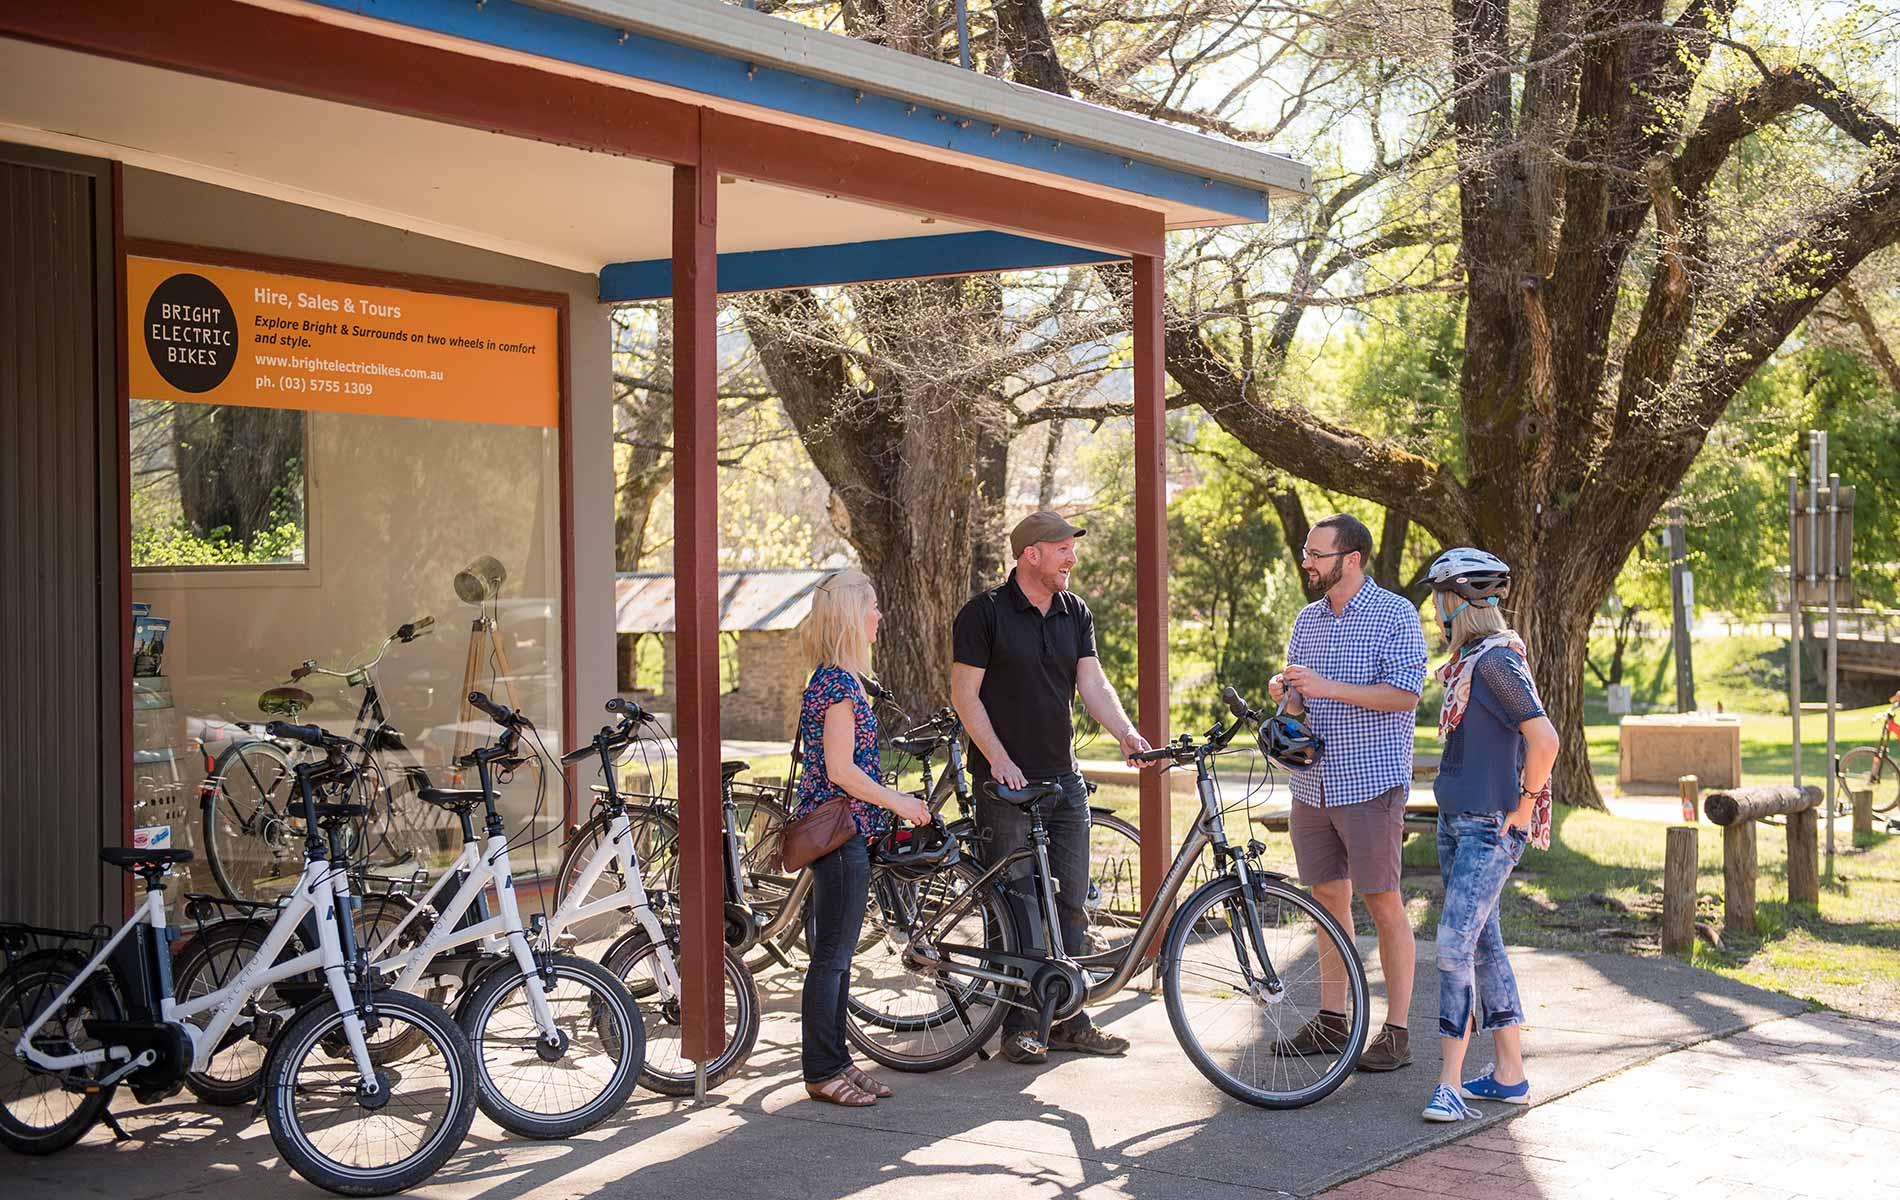 Bright Electric Bikes - Bike Hire